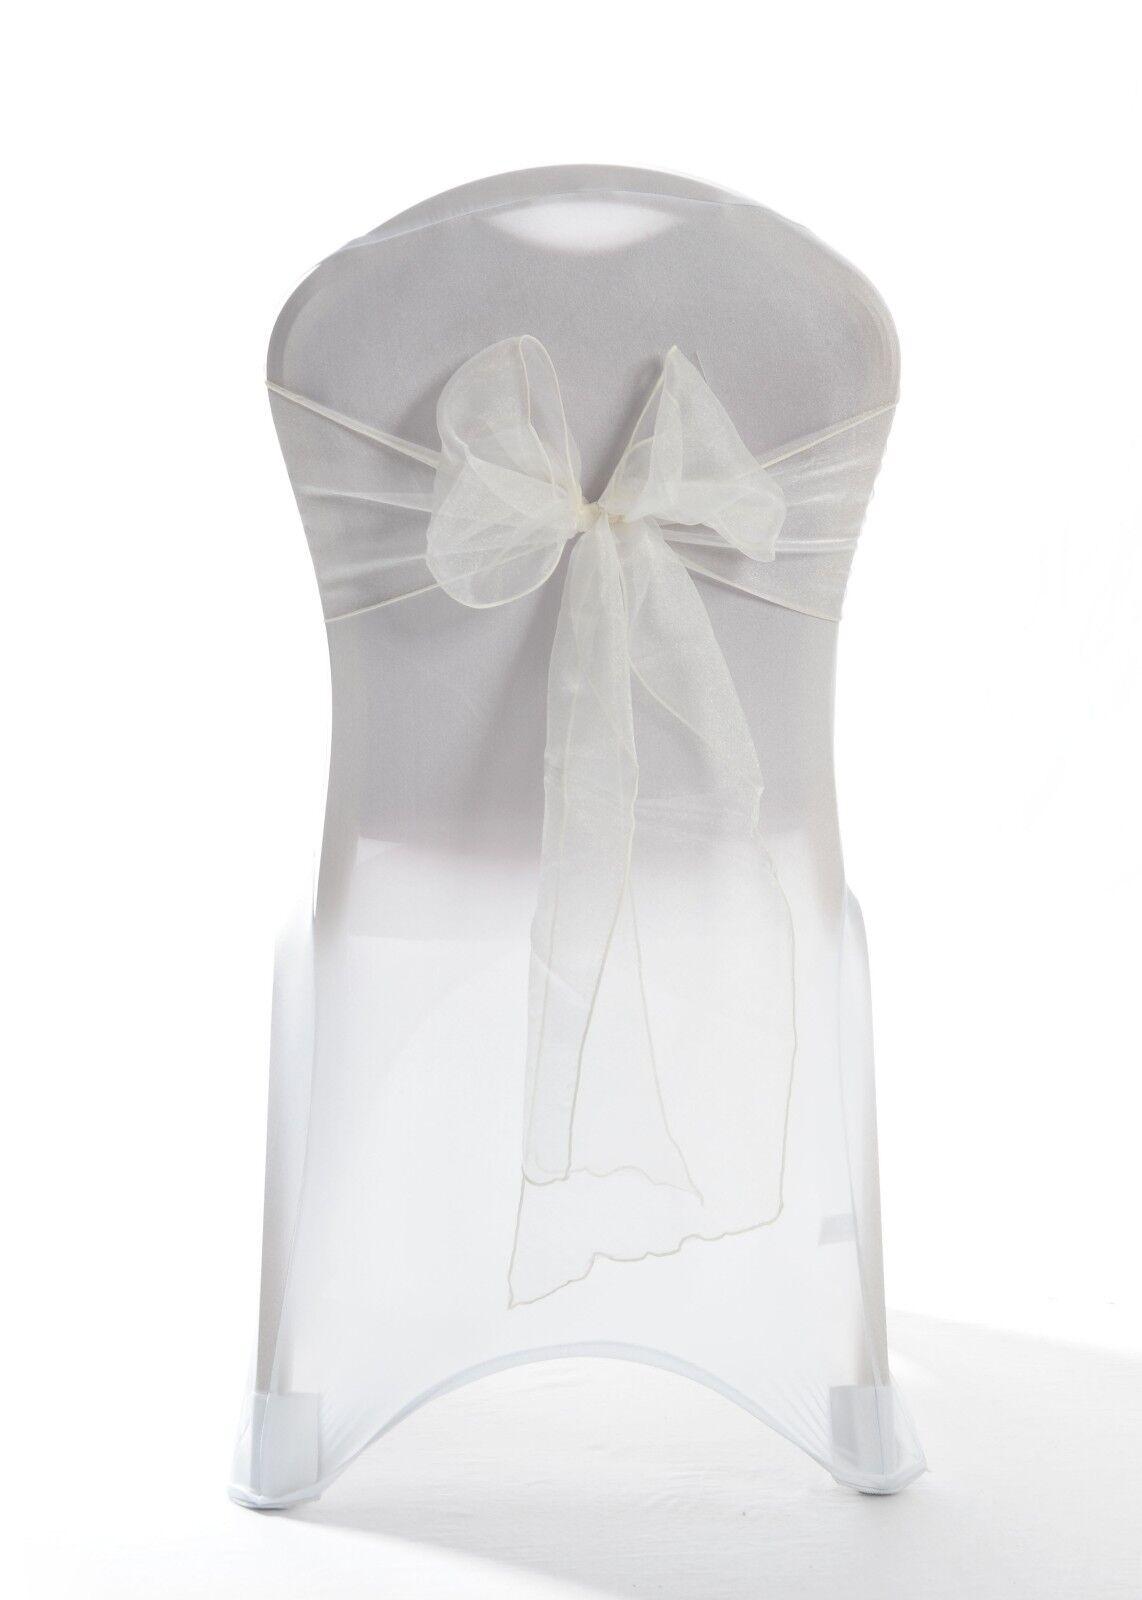 Ivory Organza Wedding Chair Sash 1,25,50 or 100 sashes